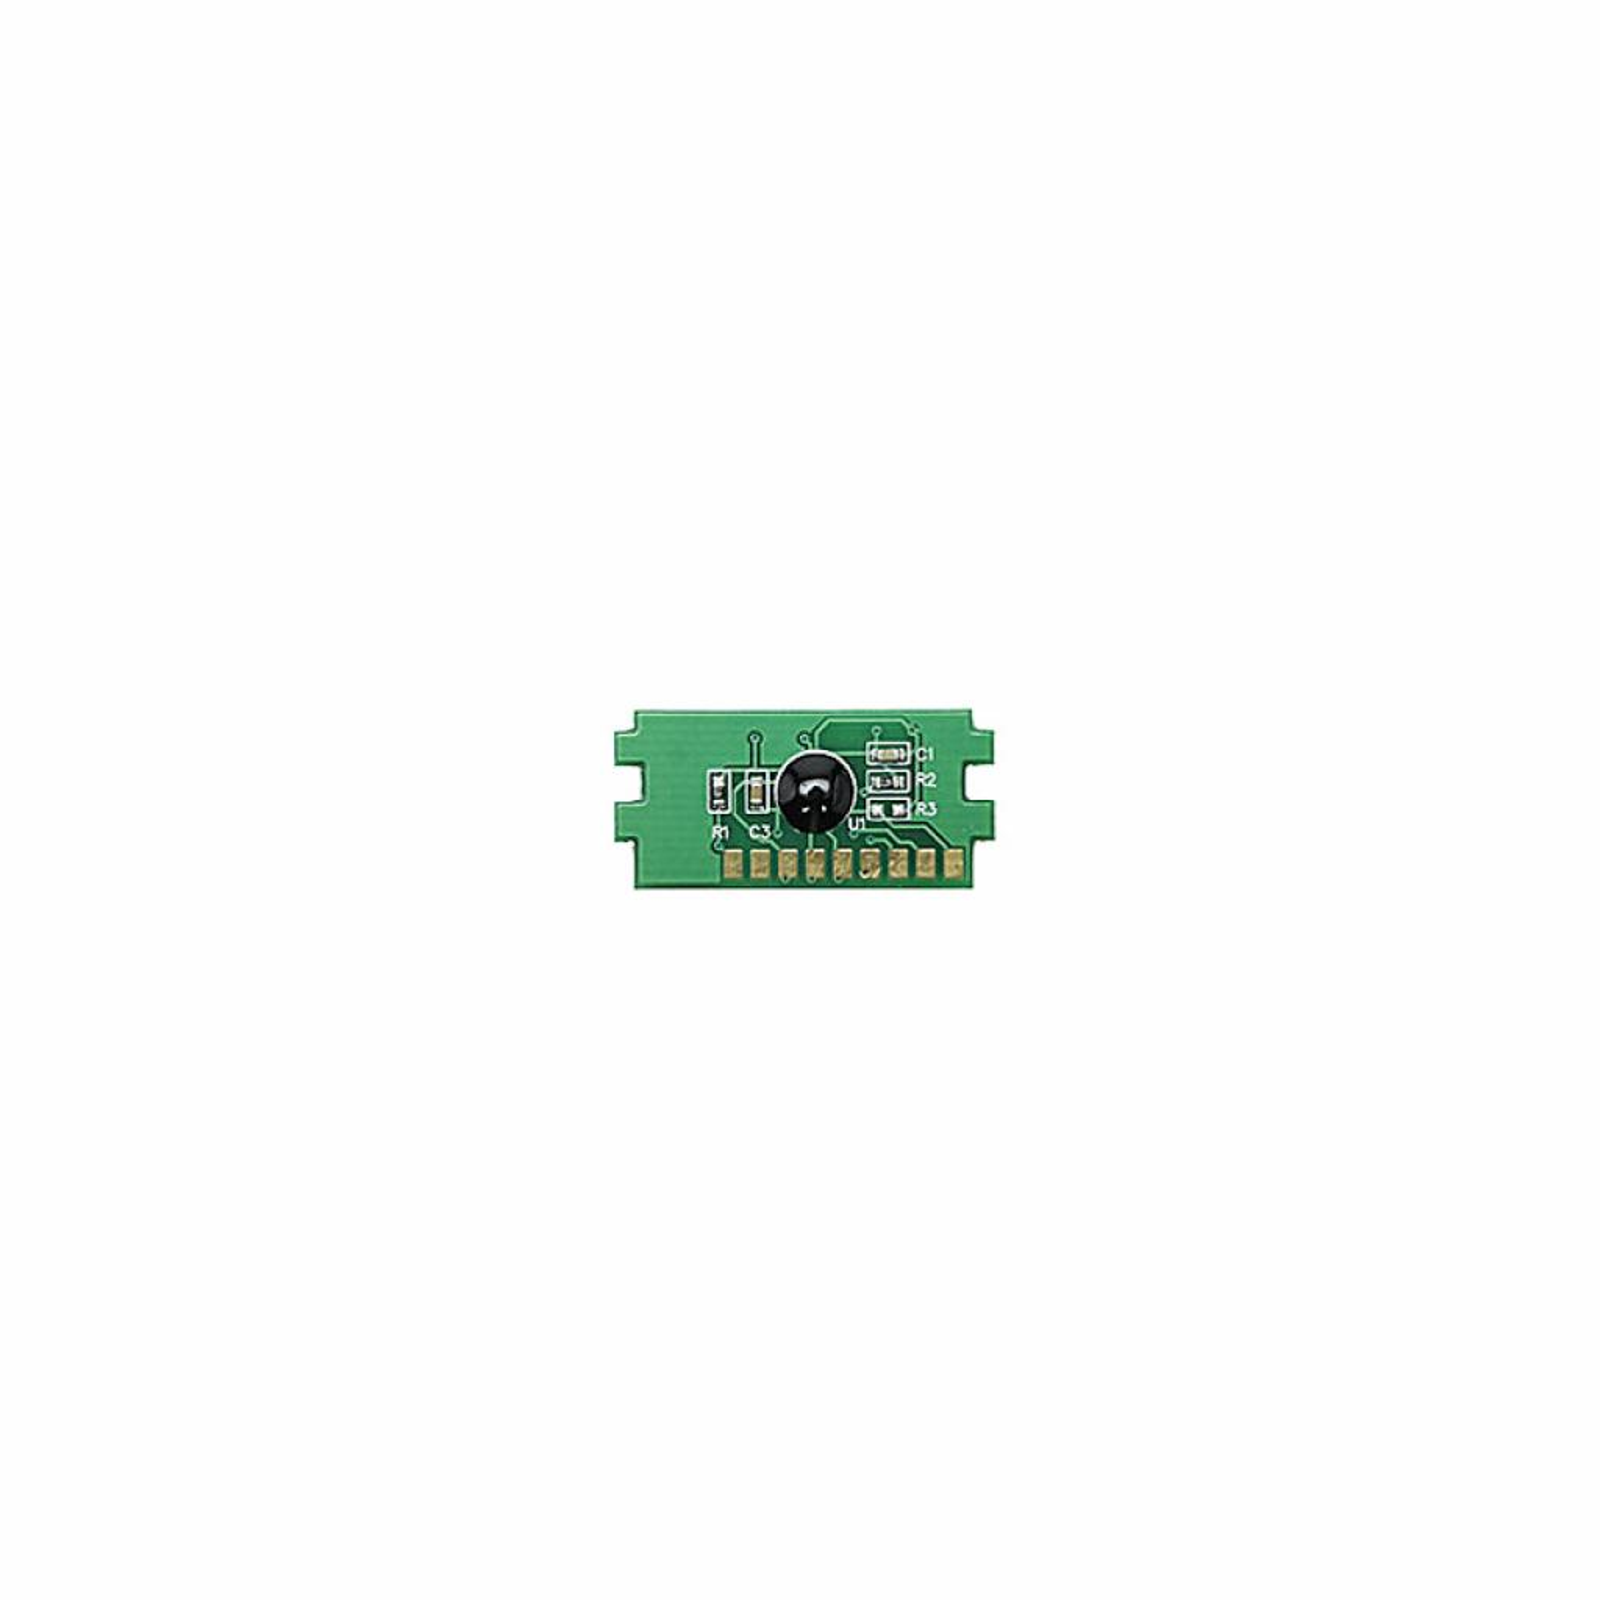 Чип для картриджа Kyocera TK-5160C (EU) 12k cyan Static Control (TK5160CP-CEU)